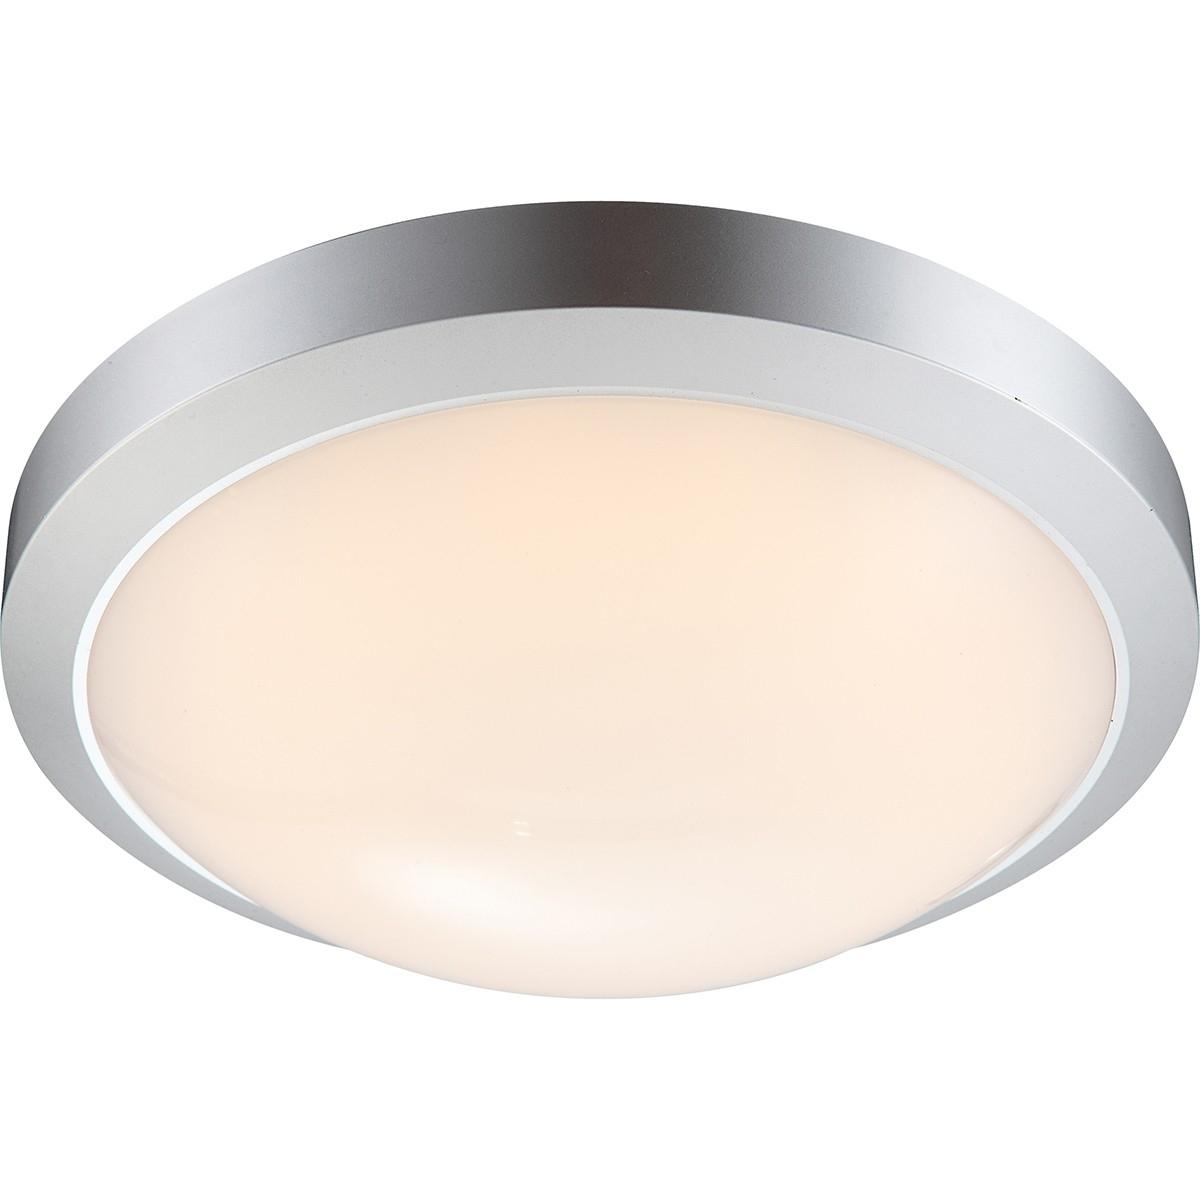 Outdoor Ceiling Led Lights Inside Latest Led Outdoor Ceiling Light , John Globo 32107 – Big Selection Of Lights (View 12 of 20)